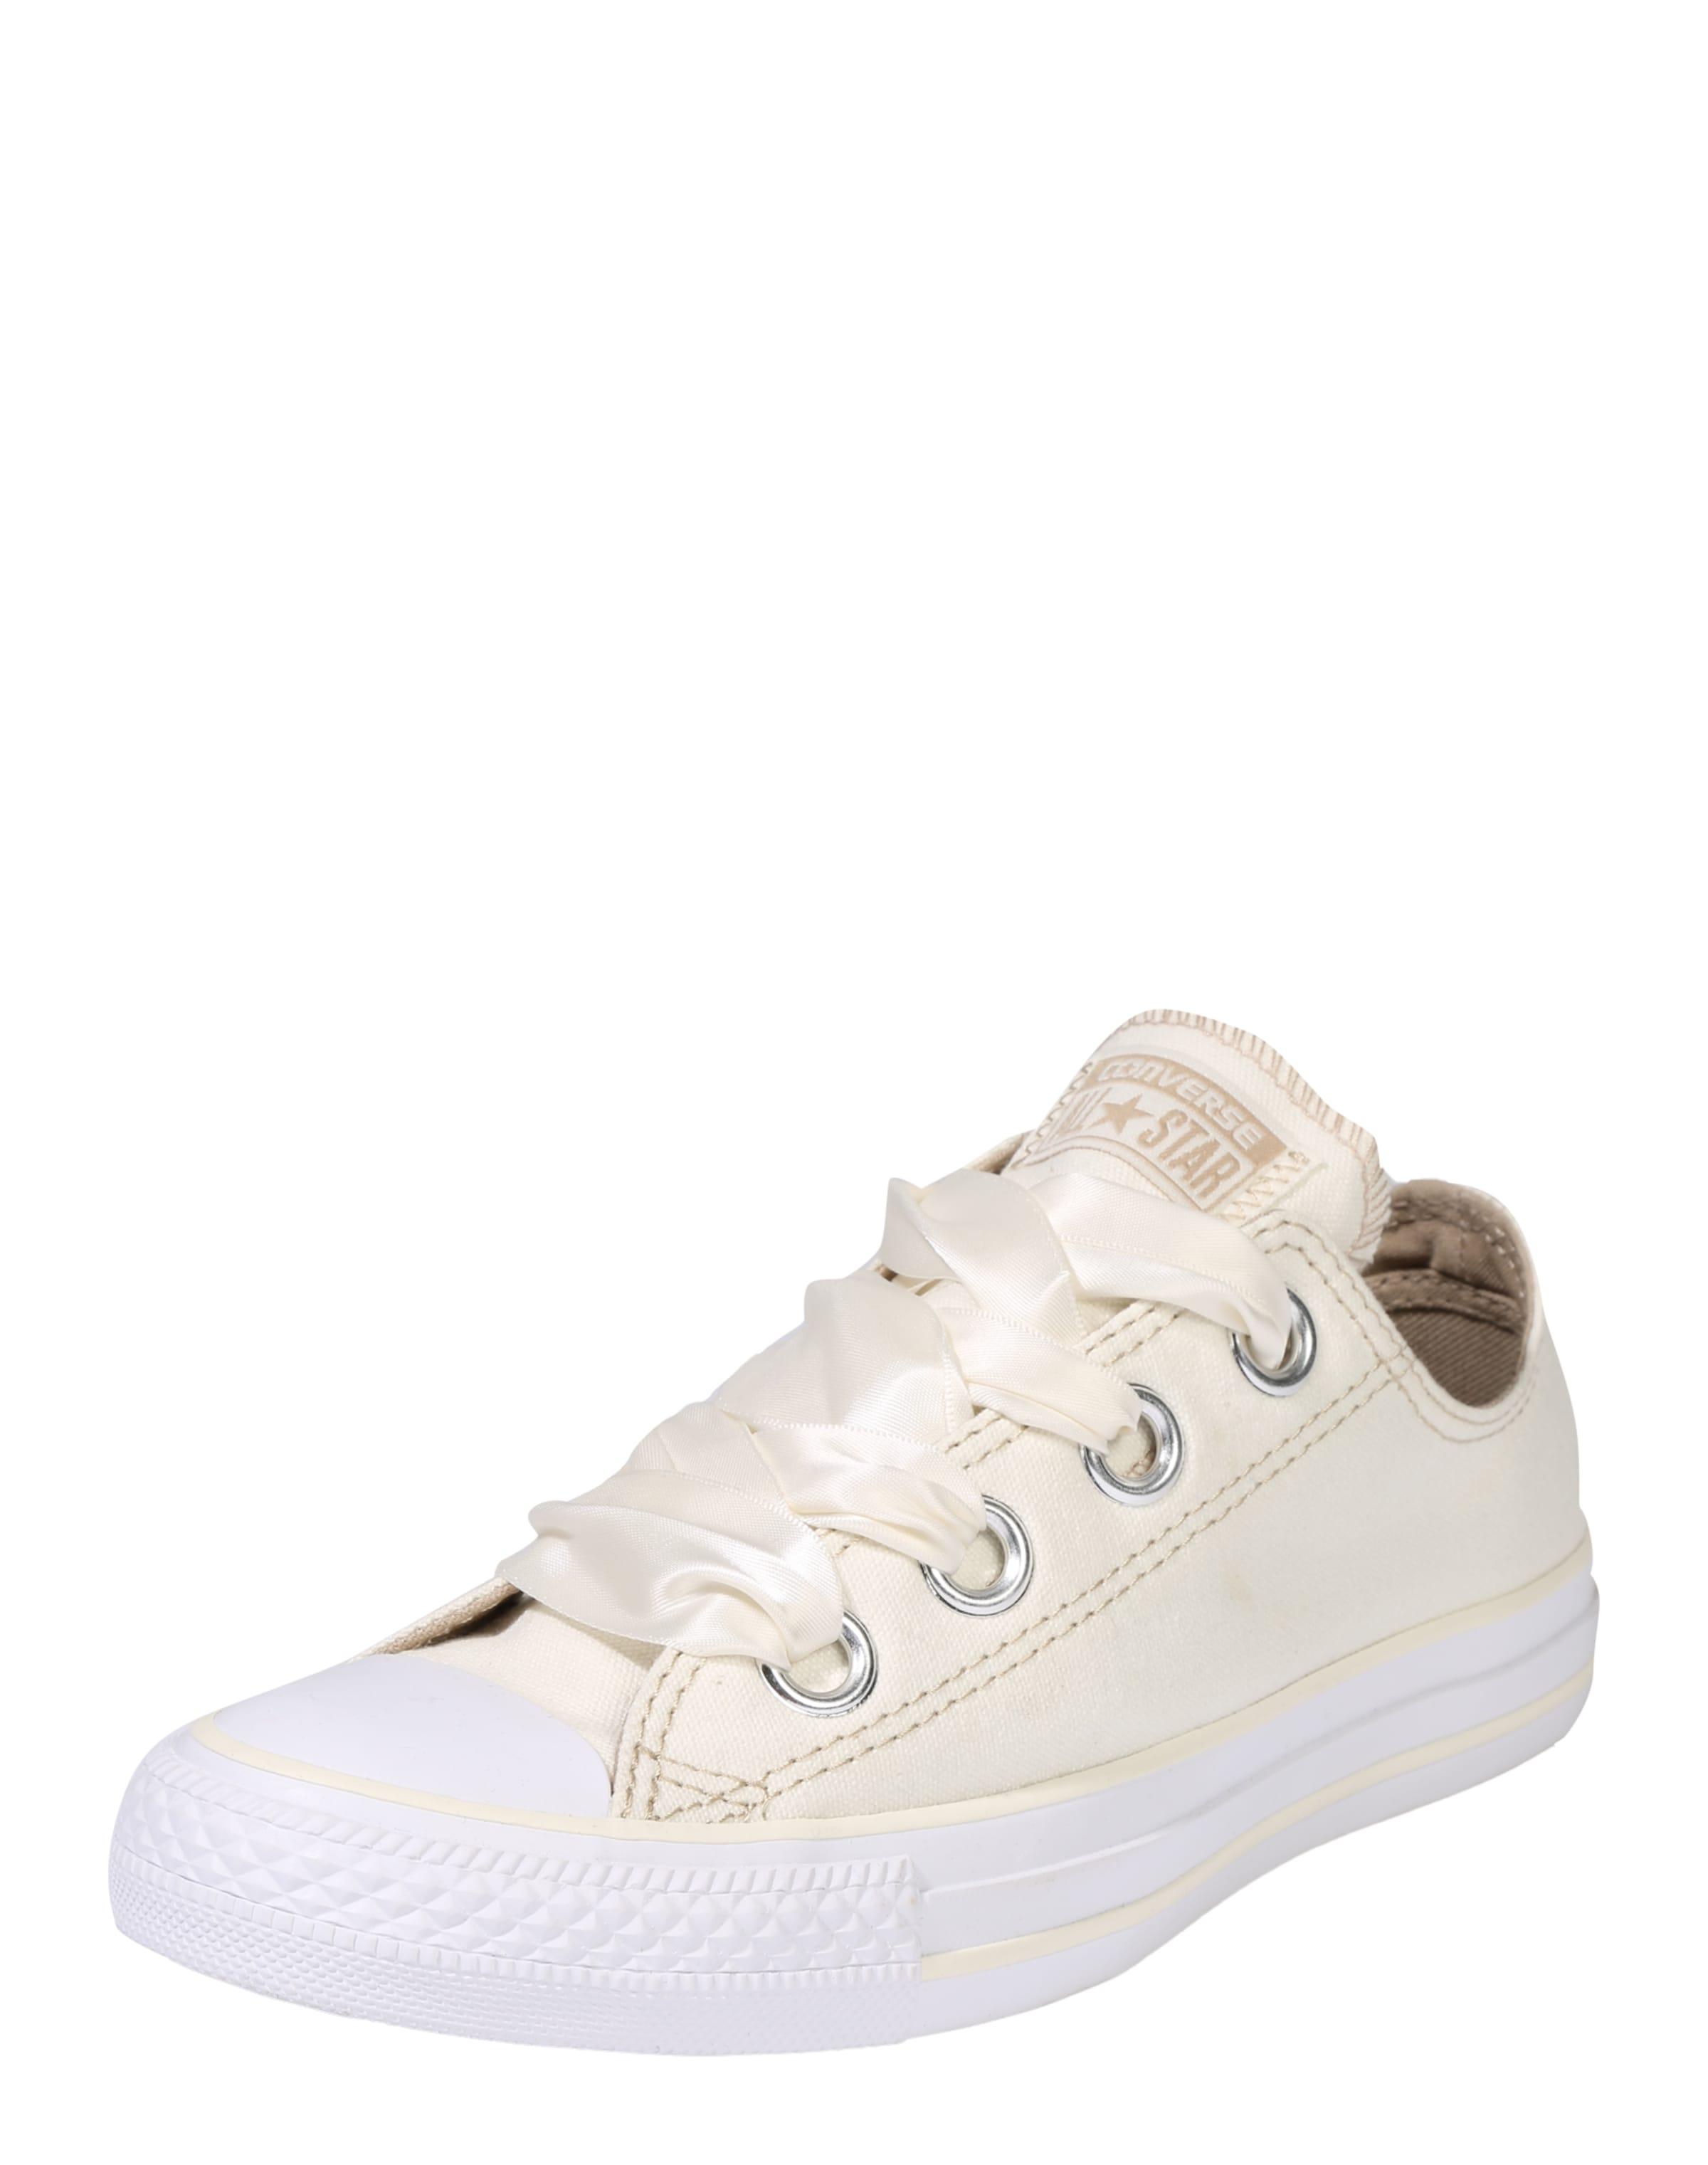 CONVERSE Sneaker CHUCK TAYLOR ALL STAR BIG EYELETS - OX